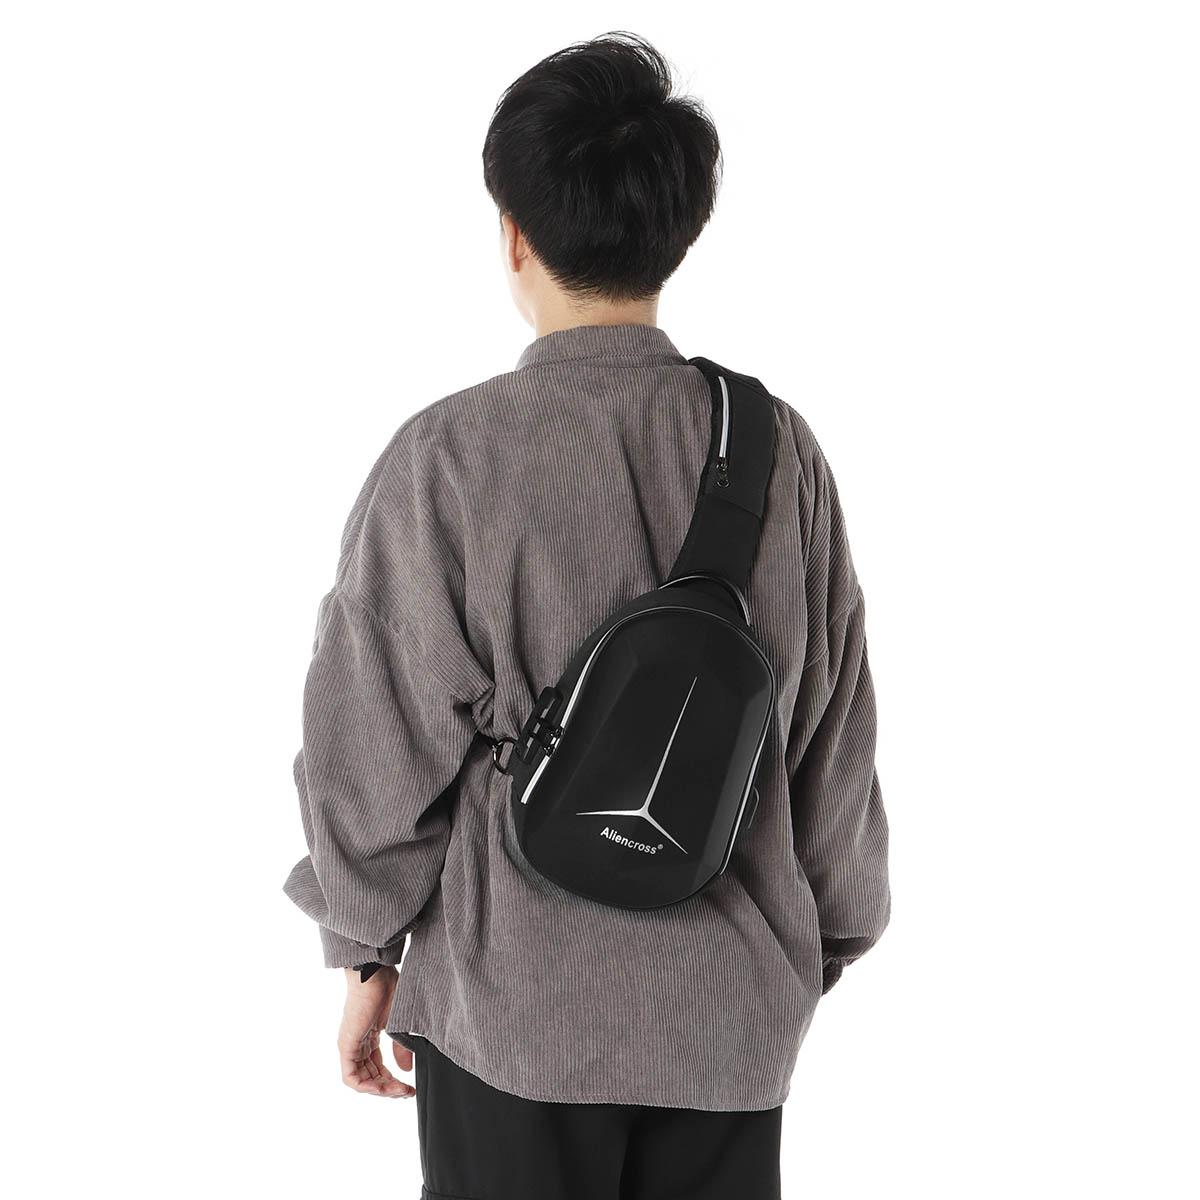 Anti-Theft Men Crossbody Bag Hard Shell Waterproof Chest Sling With Lock USB Port